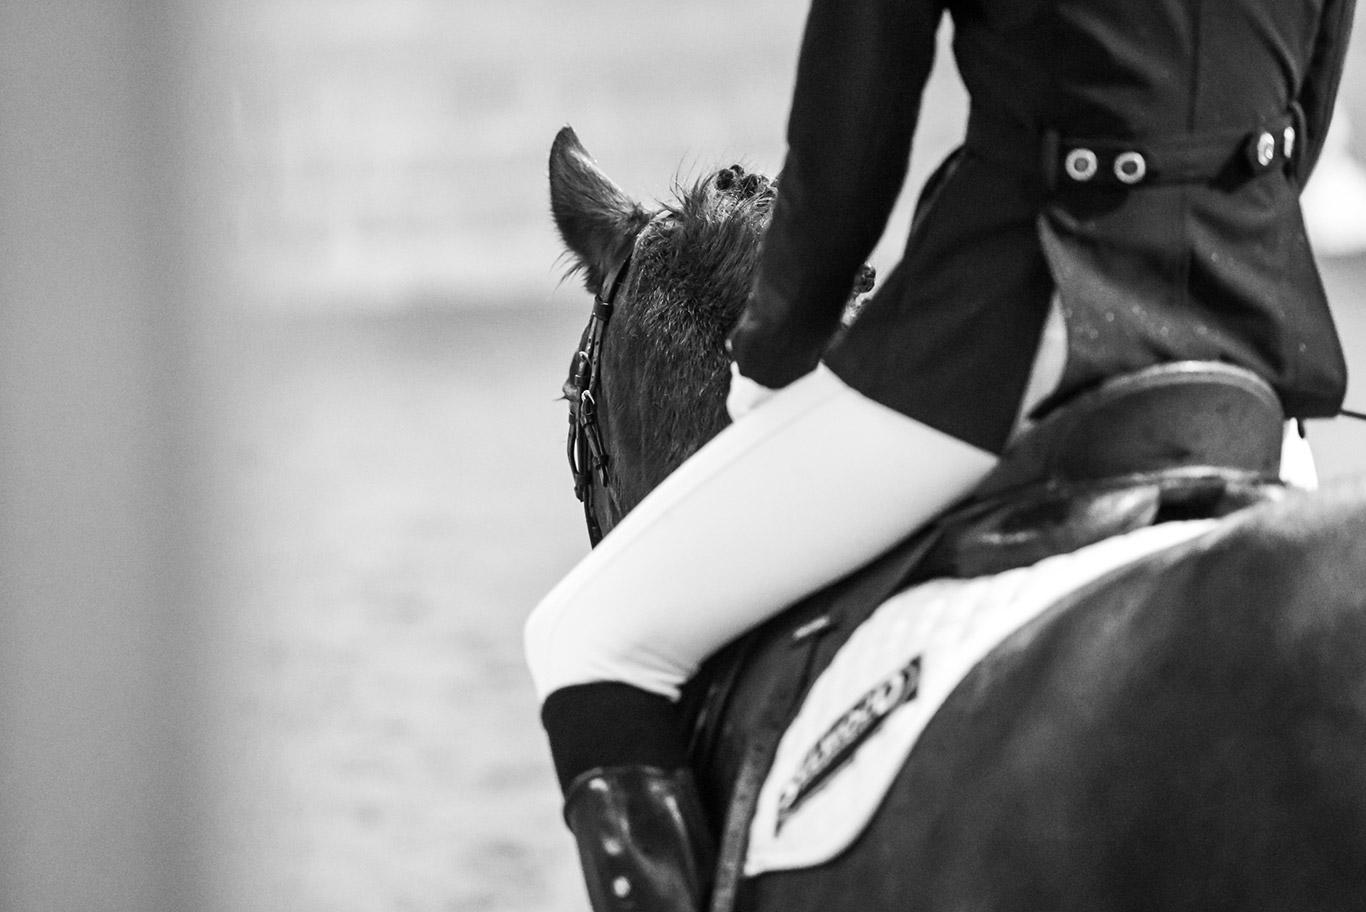 Sunday 13th August 2017 - White Horse Farm Equestrian Centre